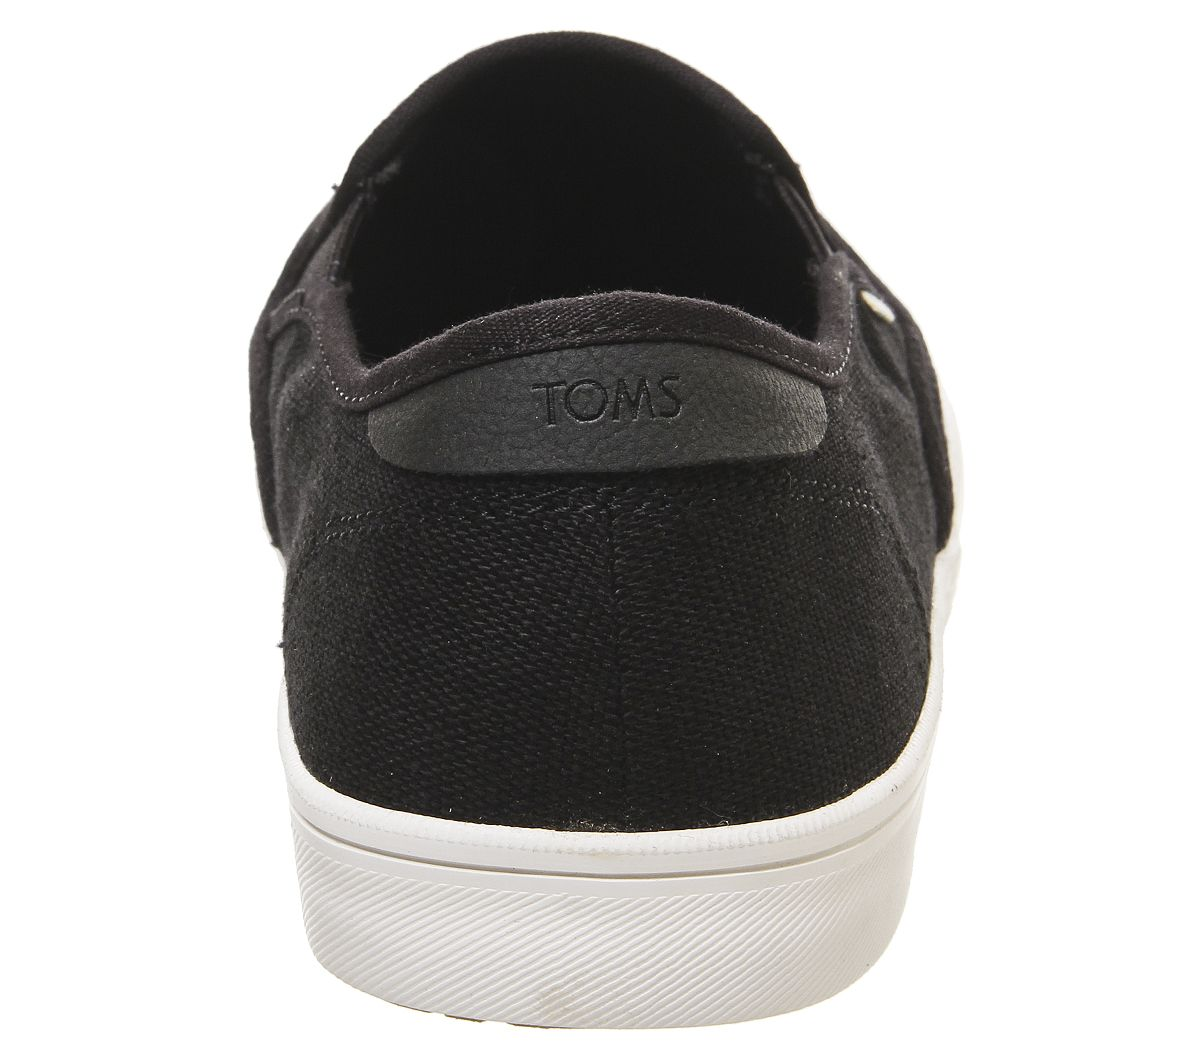 Da-Uomo-Toms-Baja-SLIP-ONS-Black-suola-bianca-scarpe-casual miniatura 4